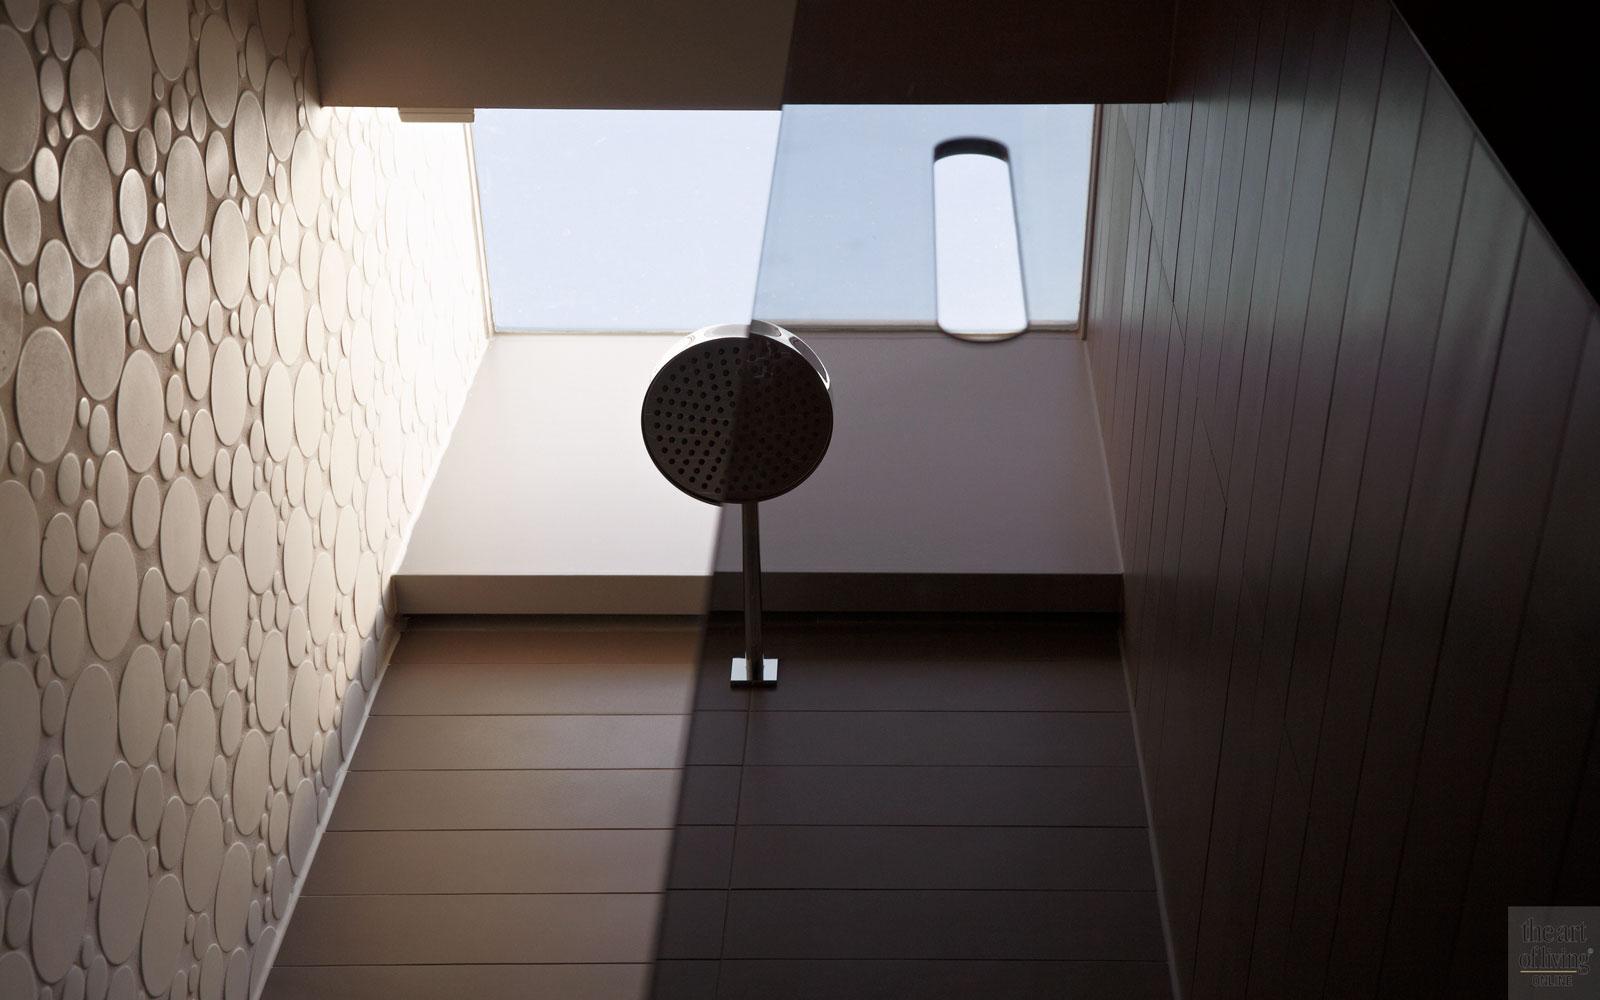 Regendouche, sanitair, glas, lichtstraat, lichtinval, extreme verbouwing, Osiris Hertman